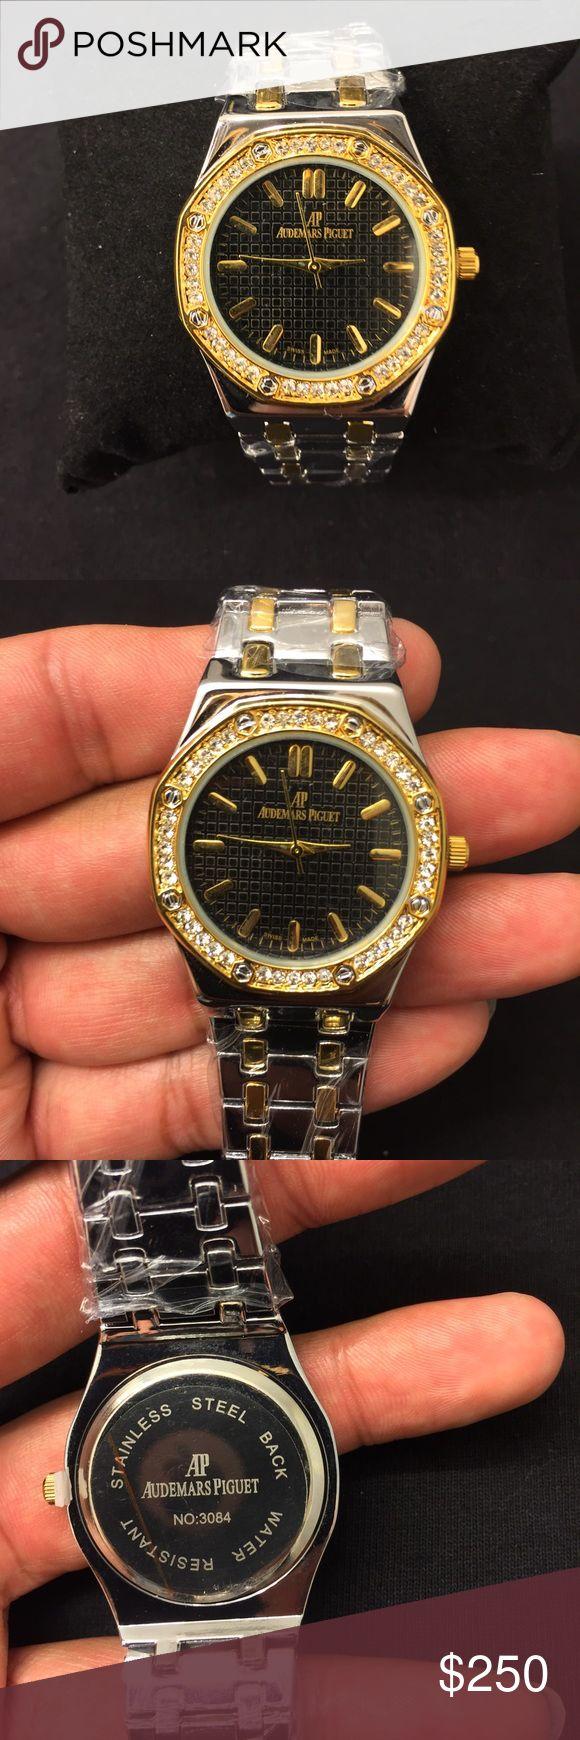 Audemars Piguet AP Ladies Watch Ladies Audemars Piguet AP Cubic Zirconia Bezel two tone silver and gold watch for sale! (Rep) very nice and elegant! Audemars Piguet Accessories Watches